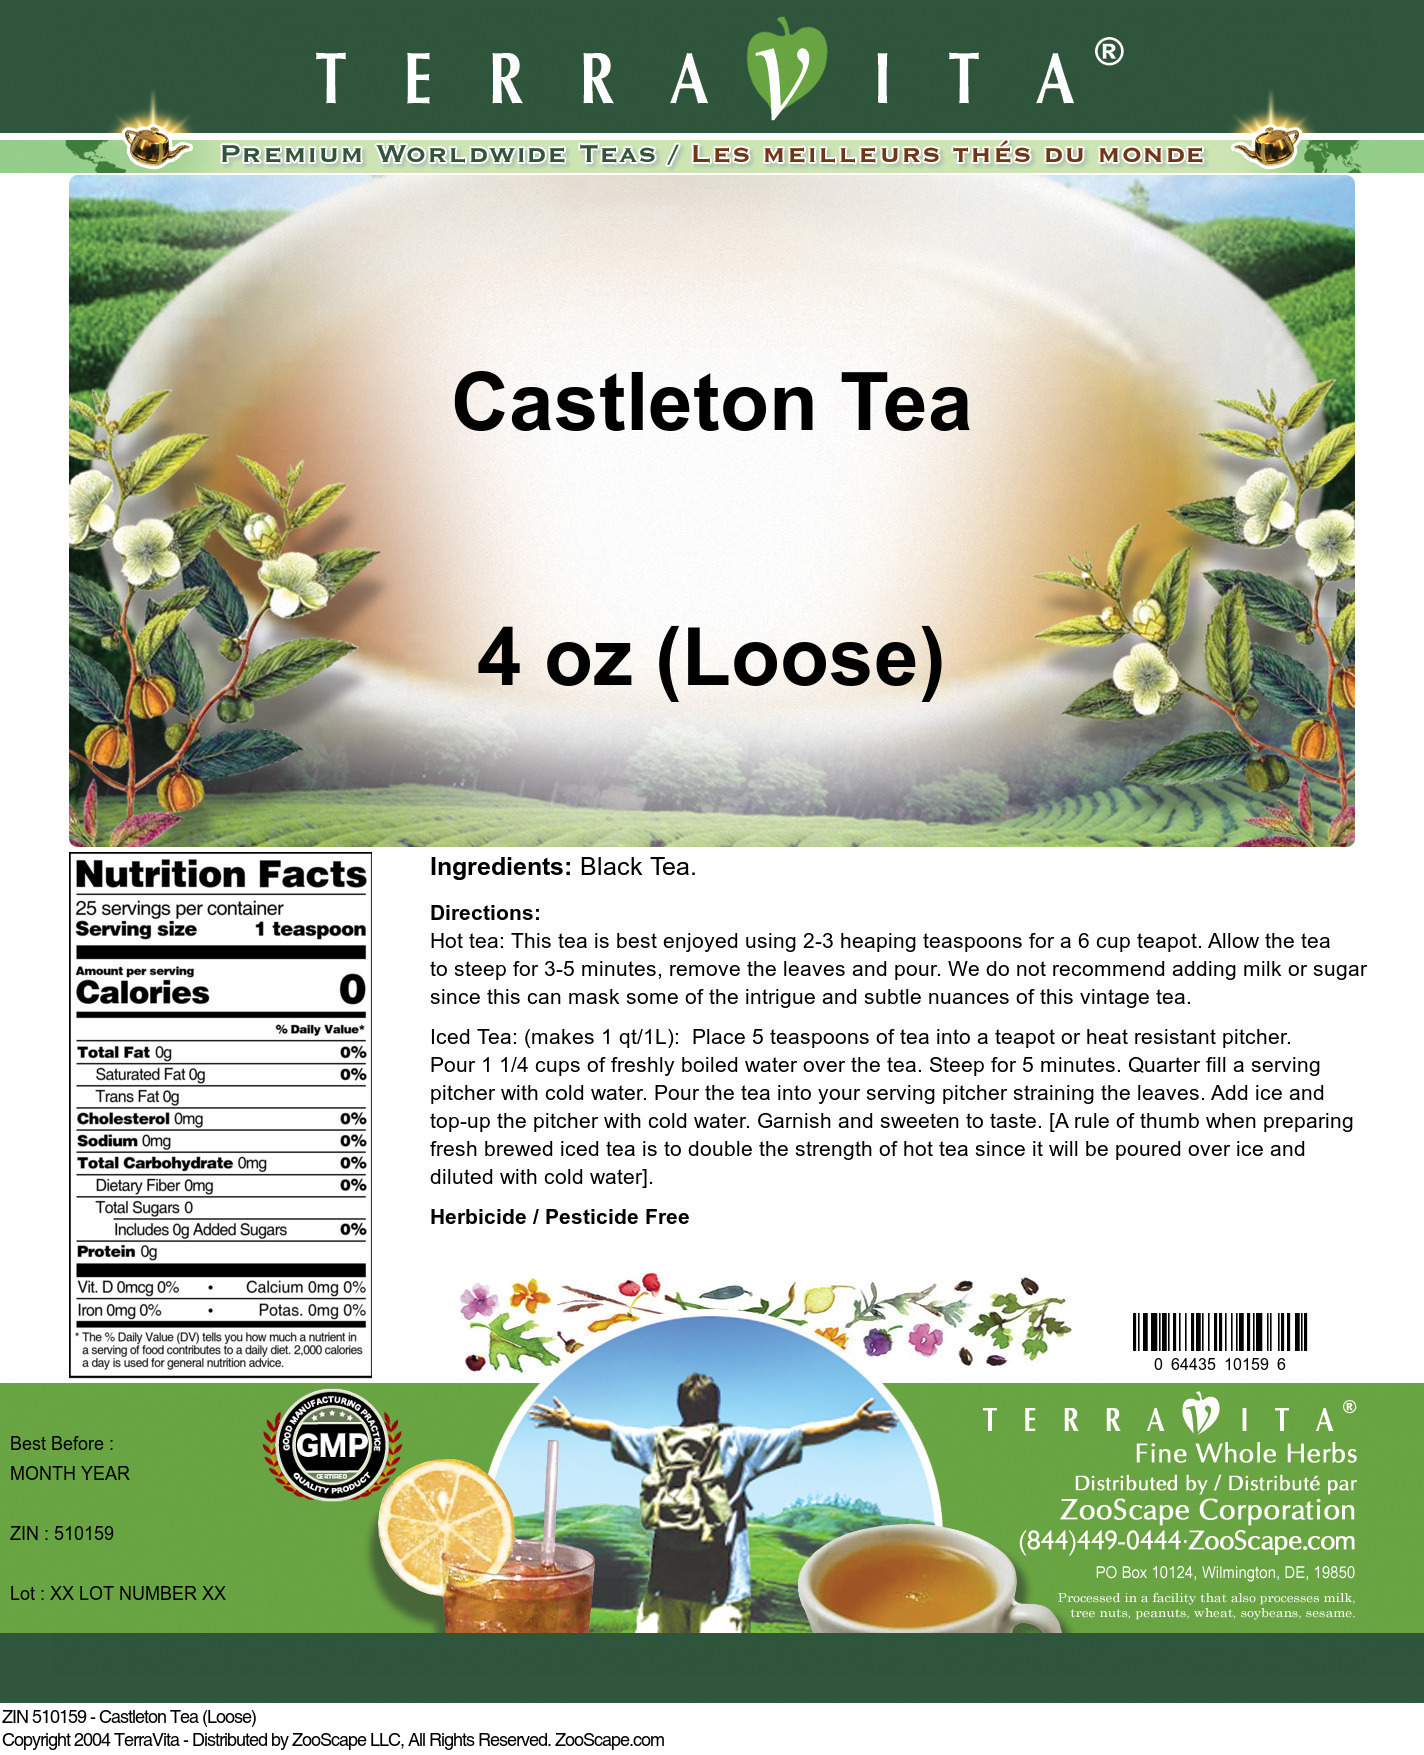 Castleton